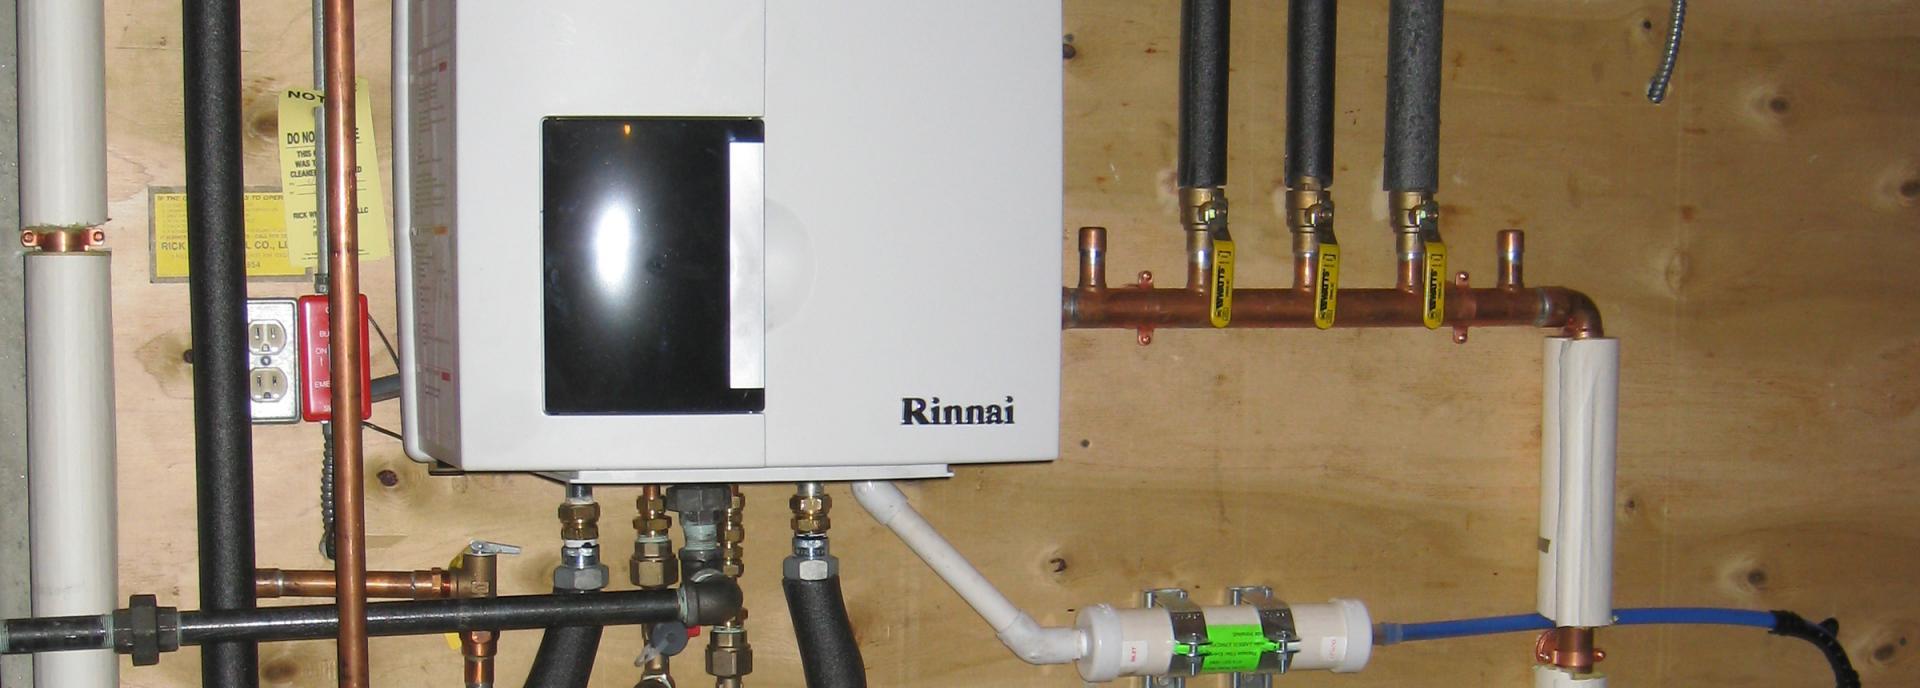 hight resolution of understanding a boiler install rinnai america navien wiring diagrams rinnai wiring diagram